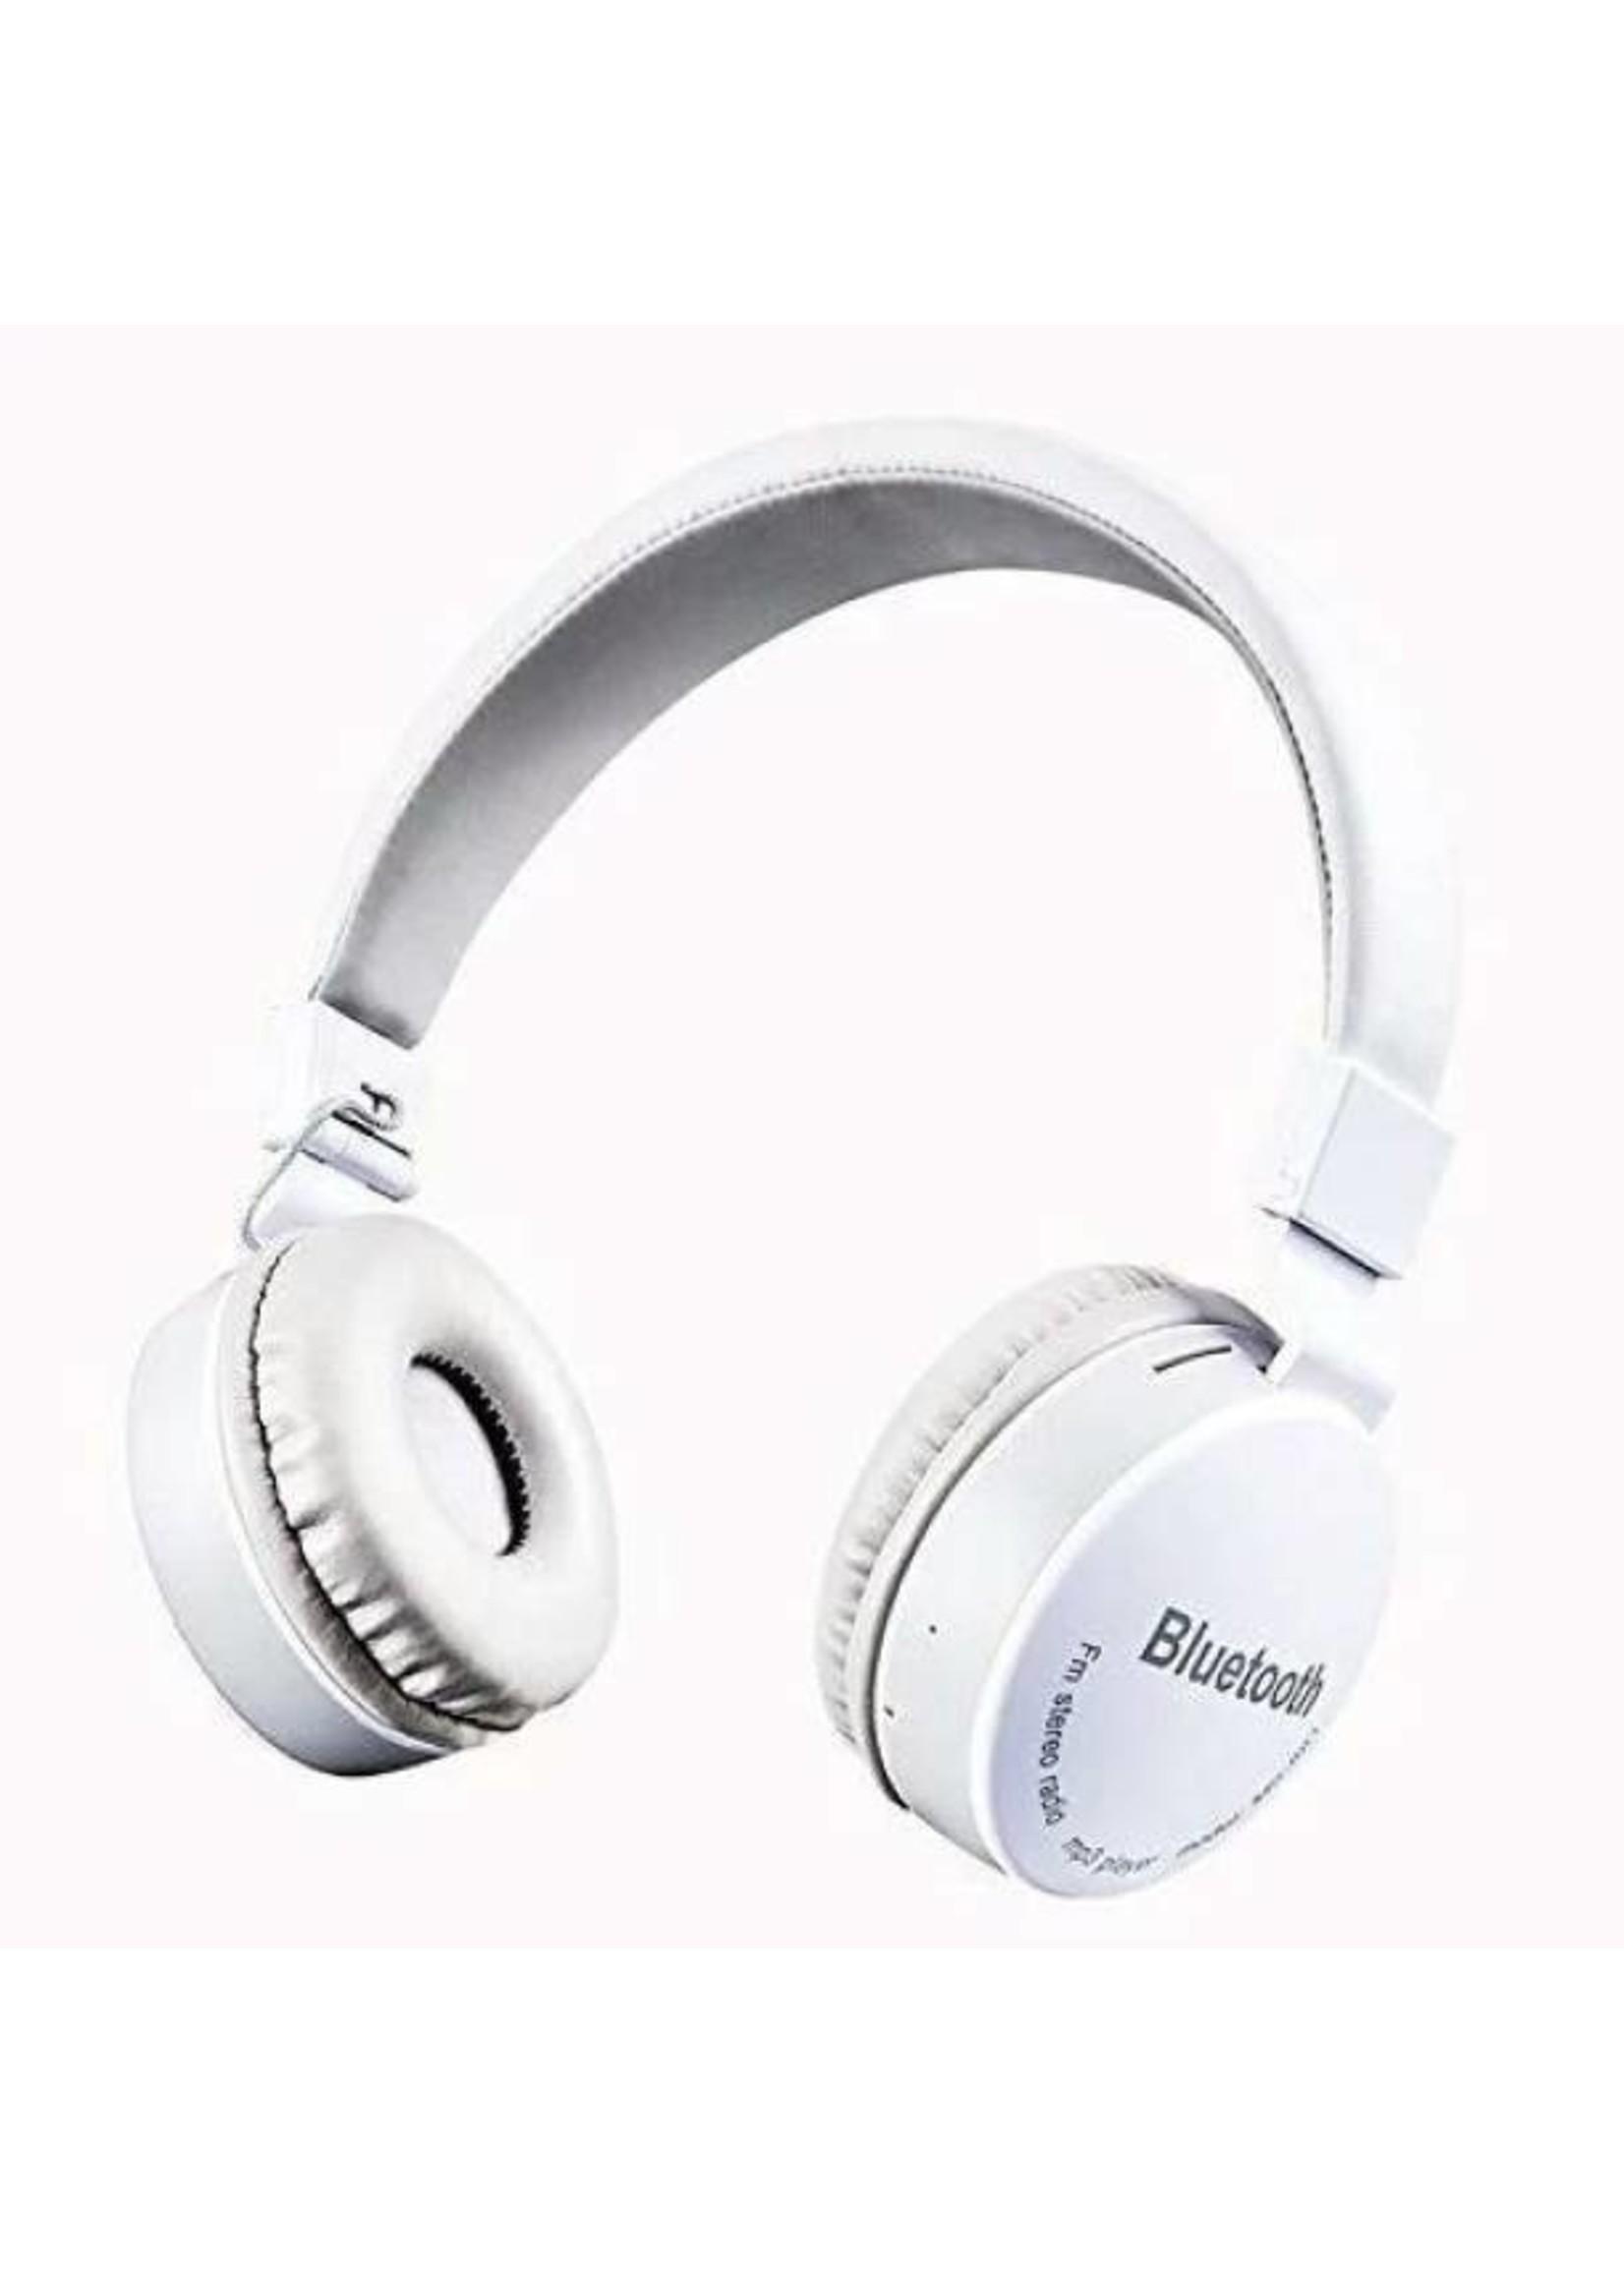 MOX Bluetooth Wireless Earbuds (MOX)